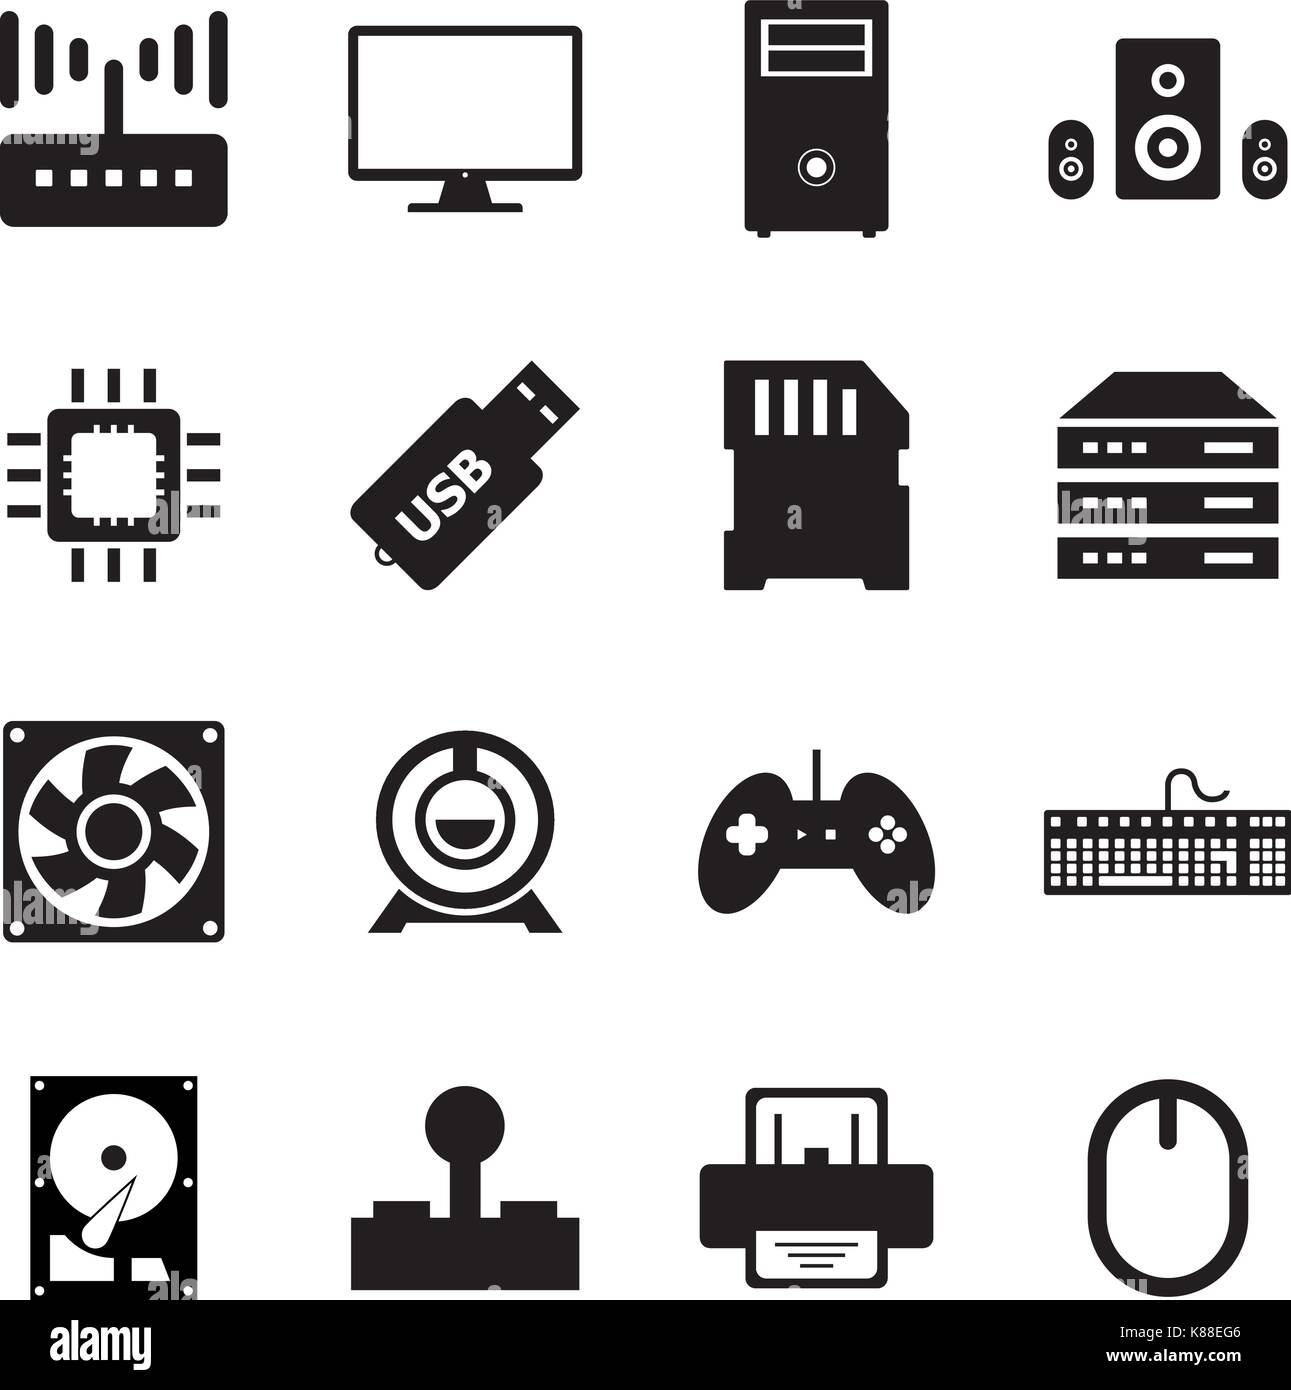 Computer hardware icon - Stock Image